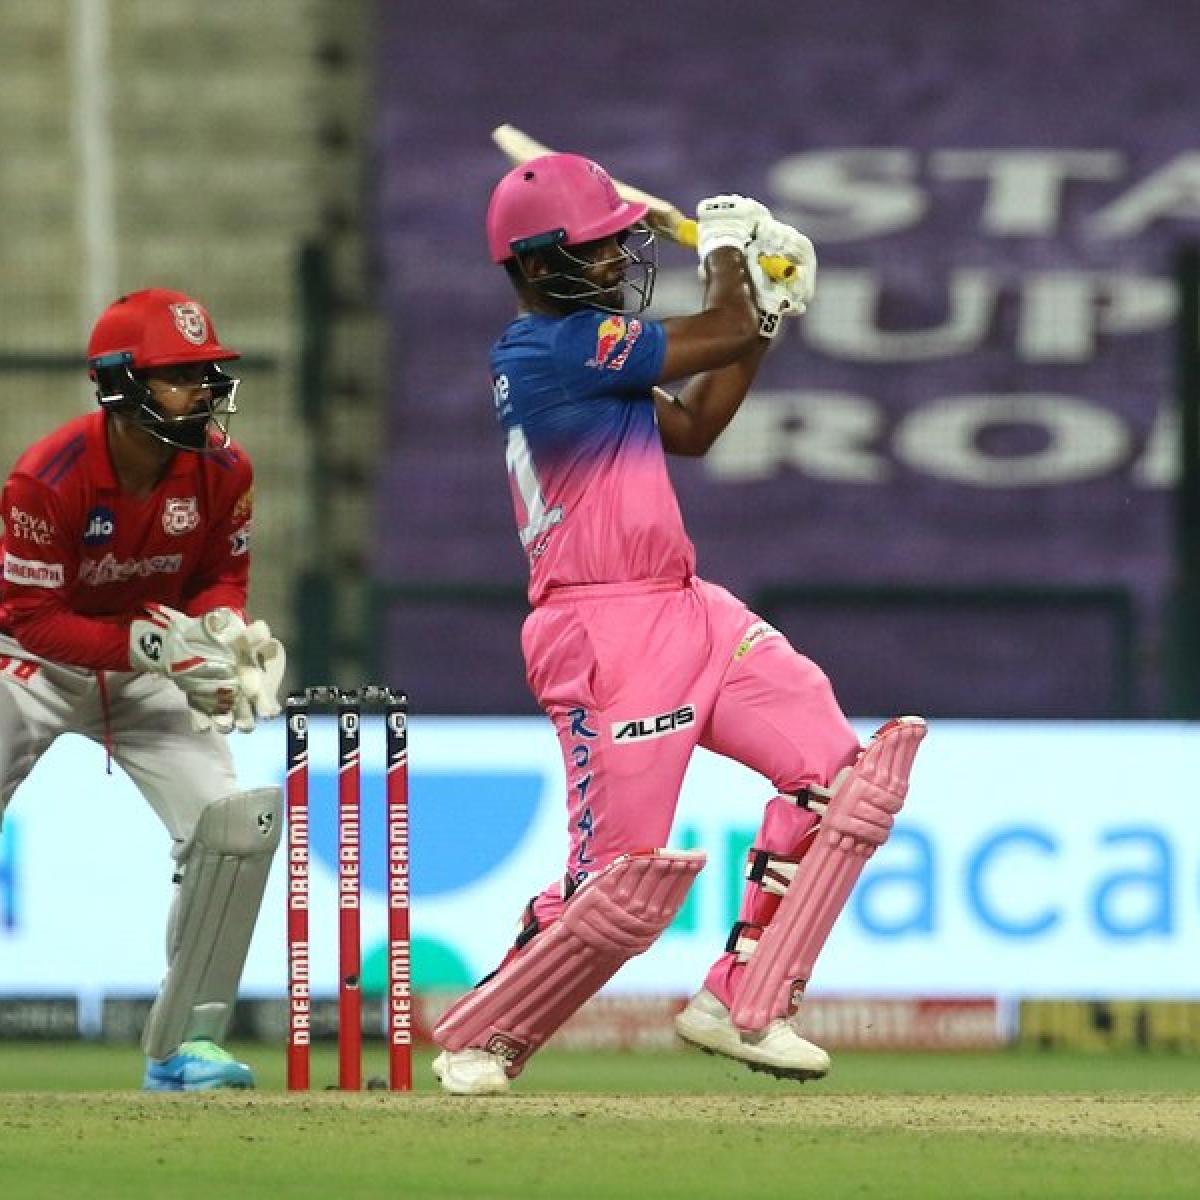 IPL 2020: Ben Stokes, Sanju Samson power RR to 7-wicket win over KXIP